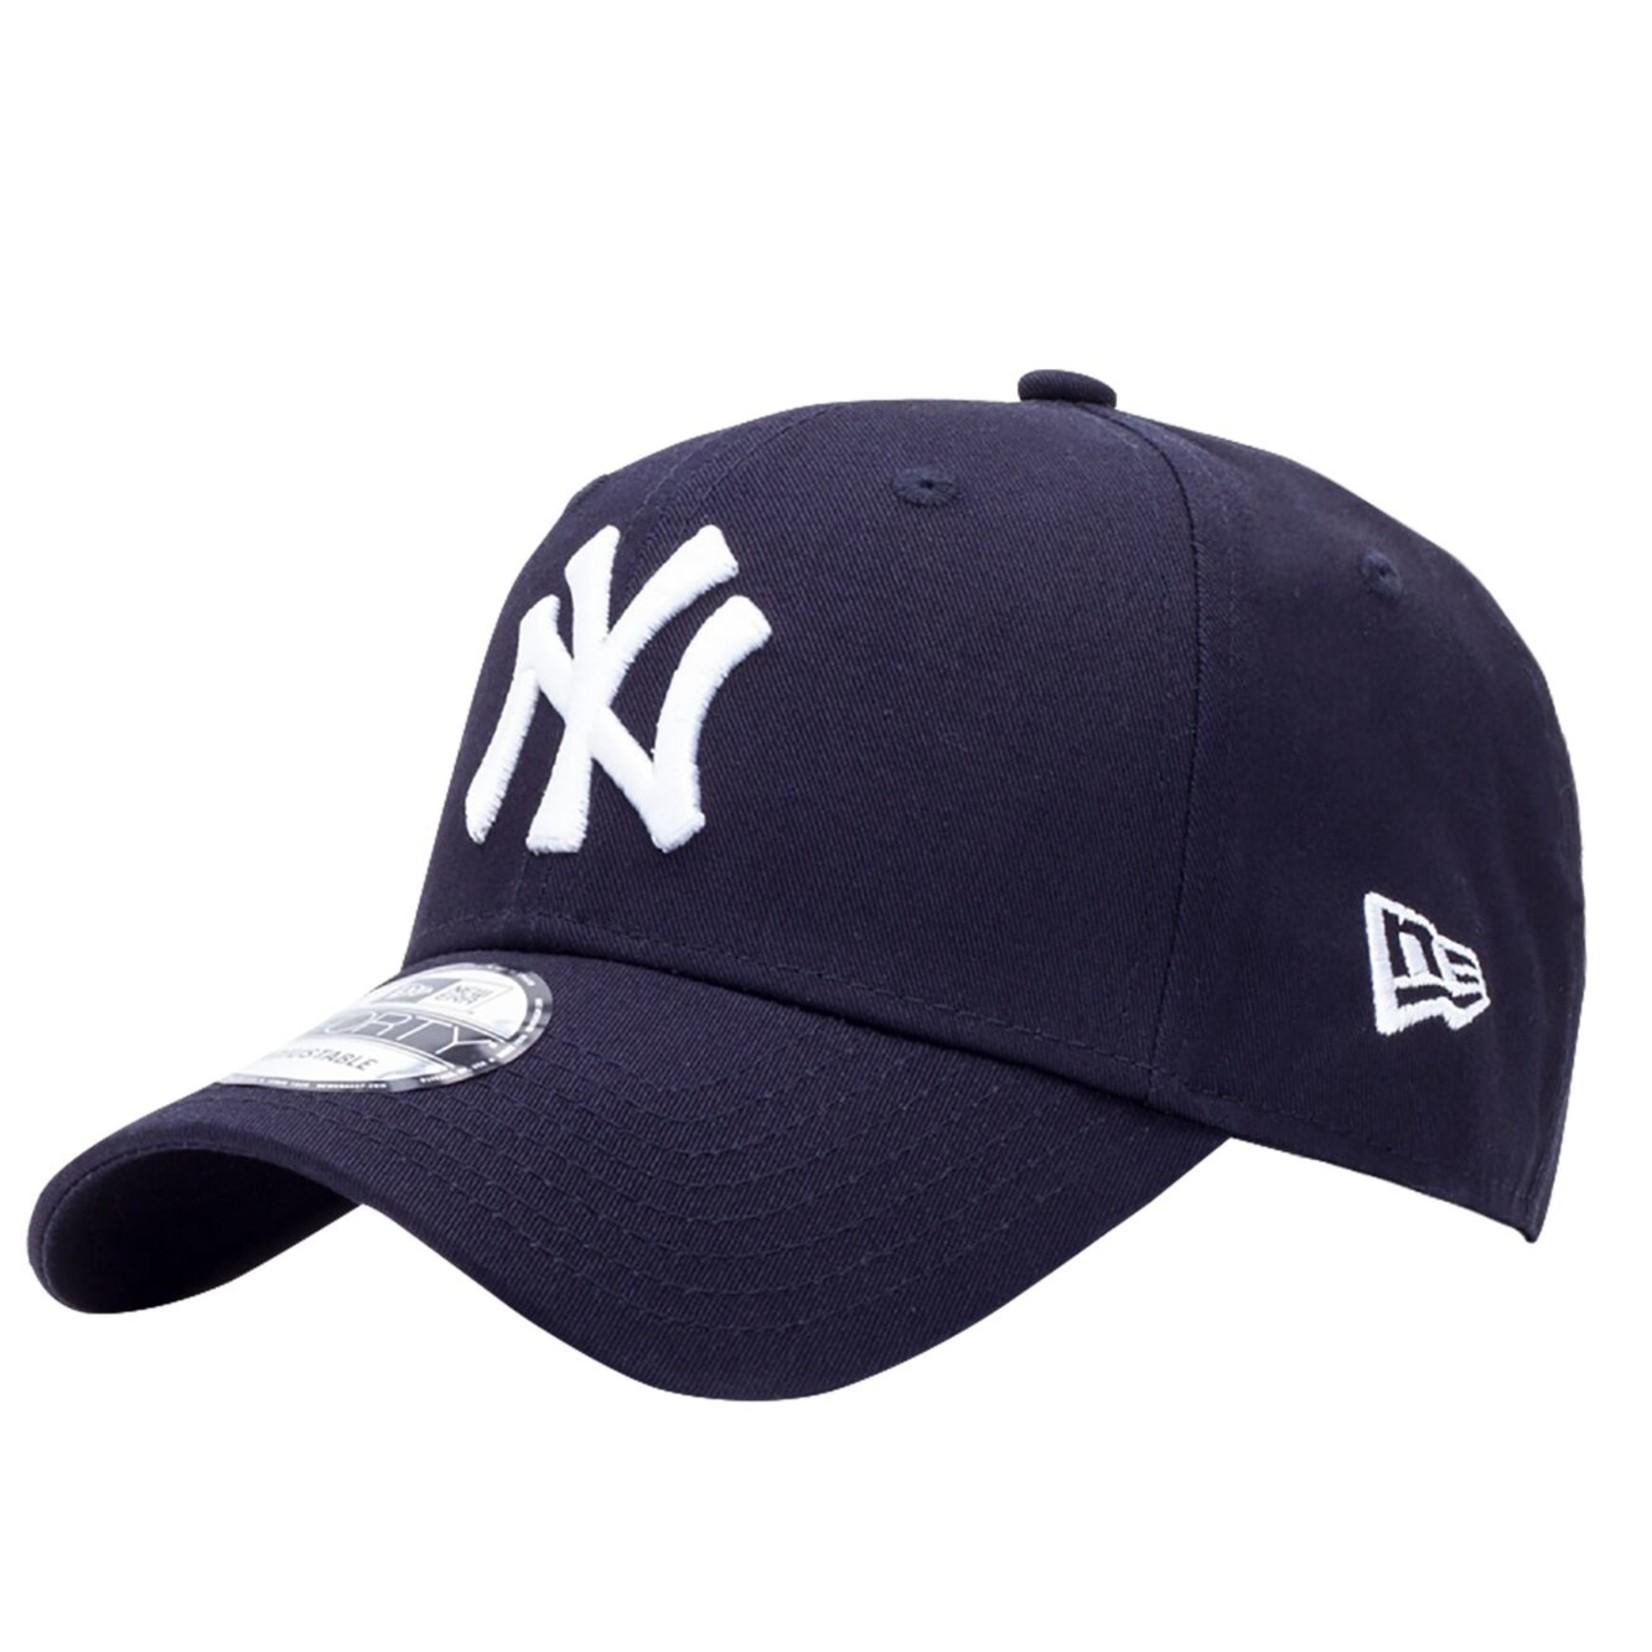 New Era NY 9forty navy/white adjustable